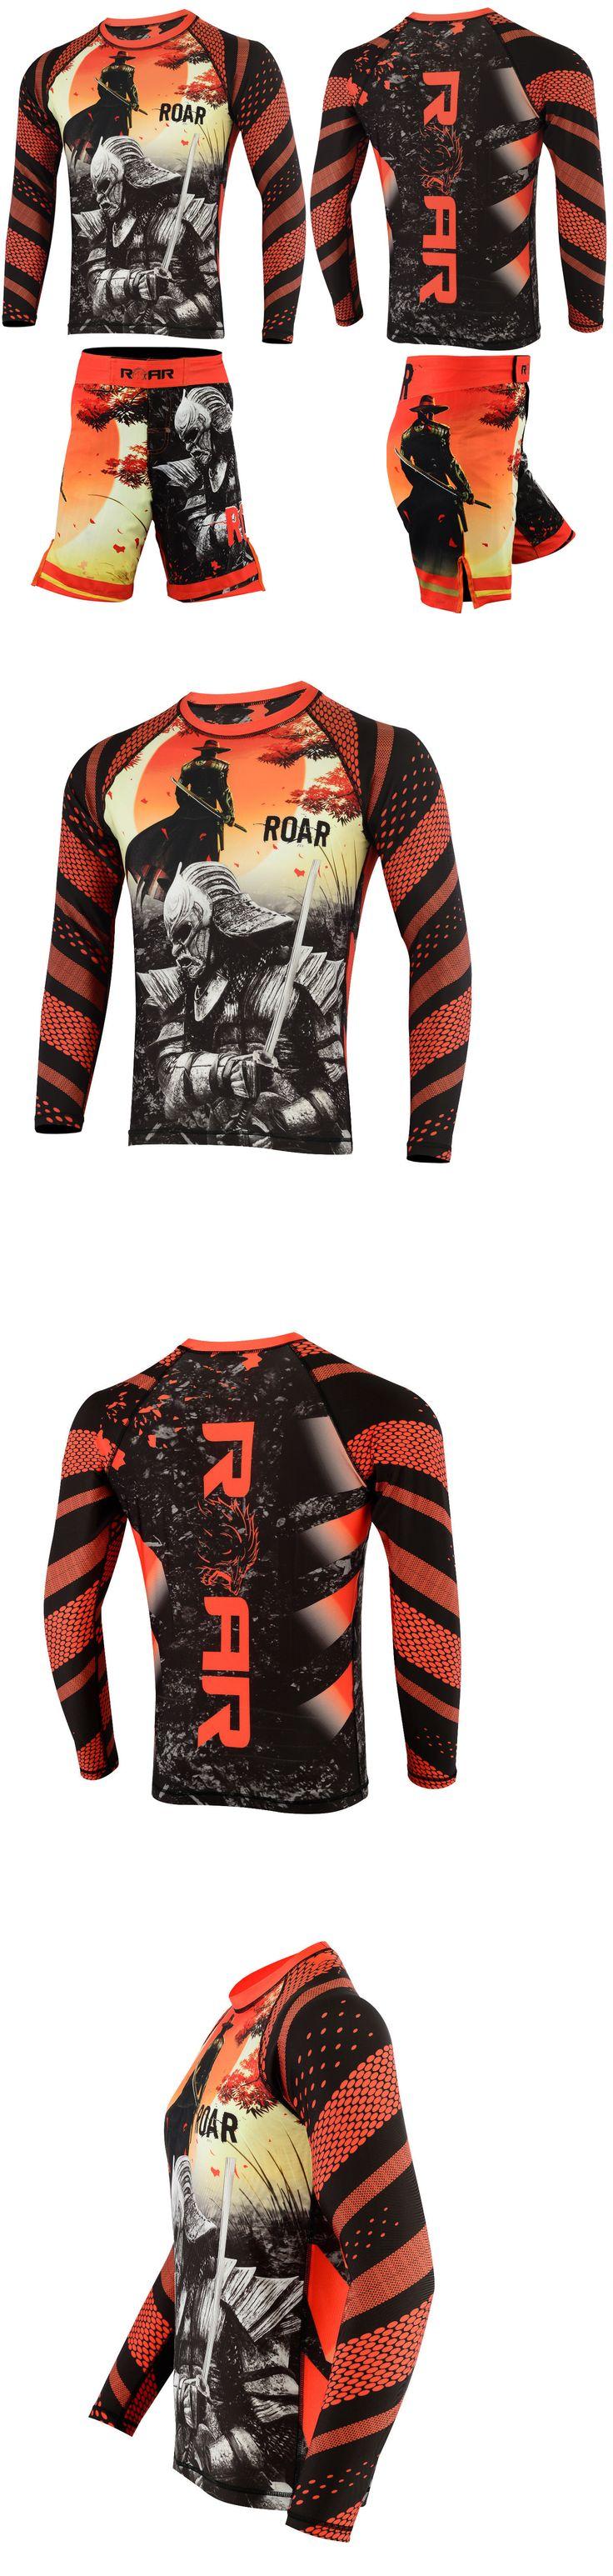 Shorts 73982: Roar Ufc Boxing Shorts Mma Rash Guards Set Ibjjf Approved Jitsu Grappling No Gi -> BUY IT NOW ONLY: $47.47 on eBay!